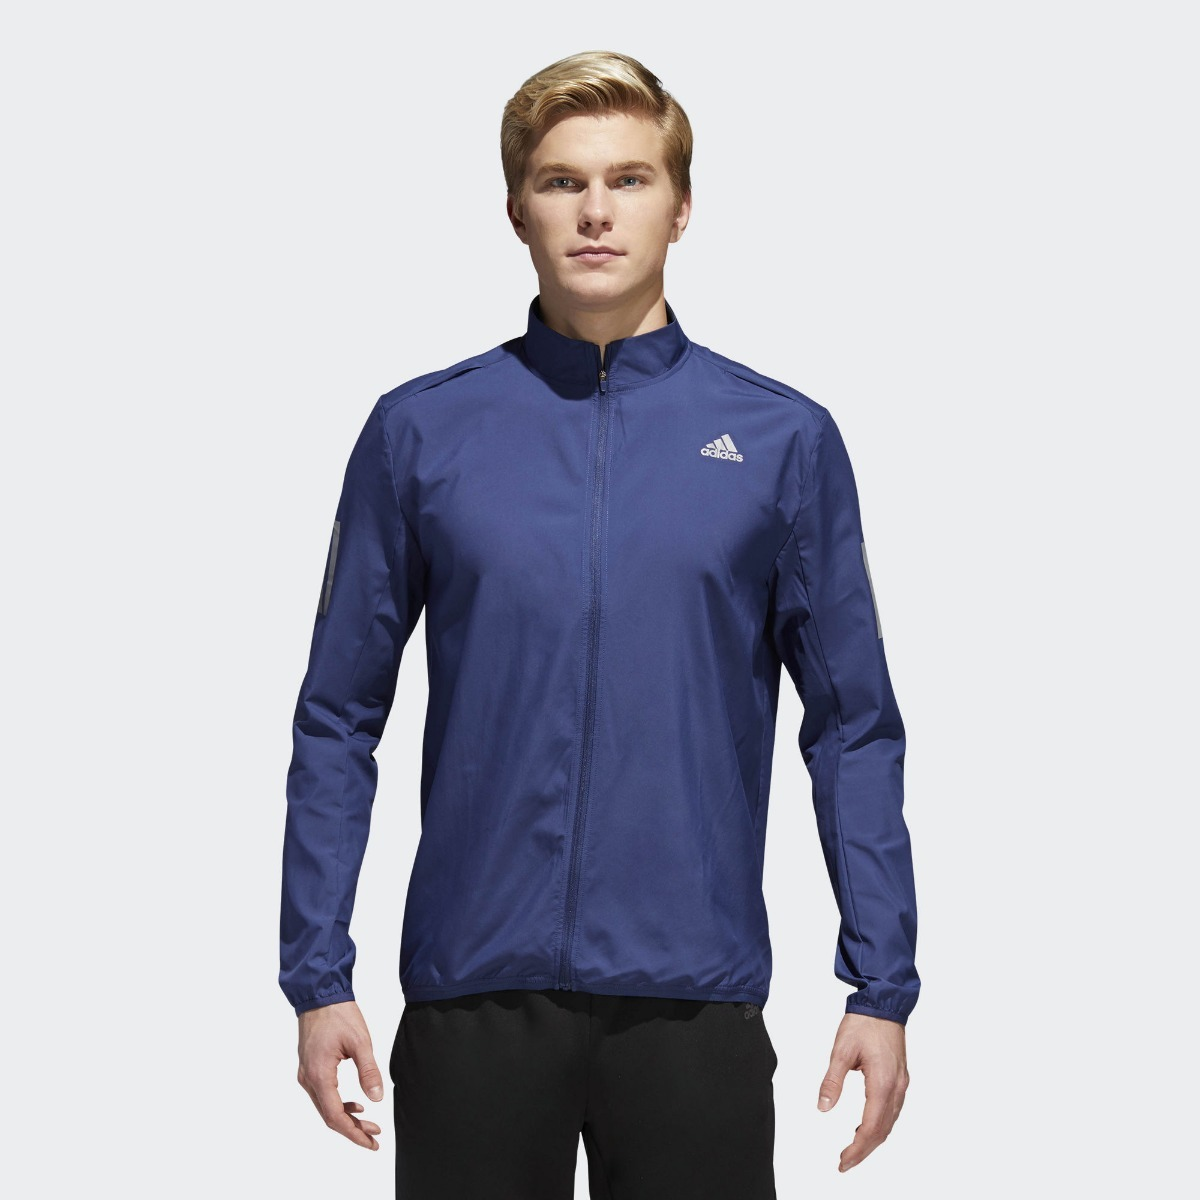 124c0c6349e25b casaca-chaqueta-cortaviento-adidas-response-D NQ NP 929805-MPE27125588530 042018-F.jpg